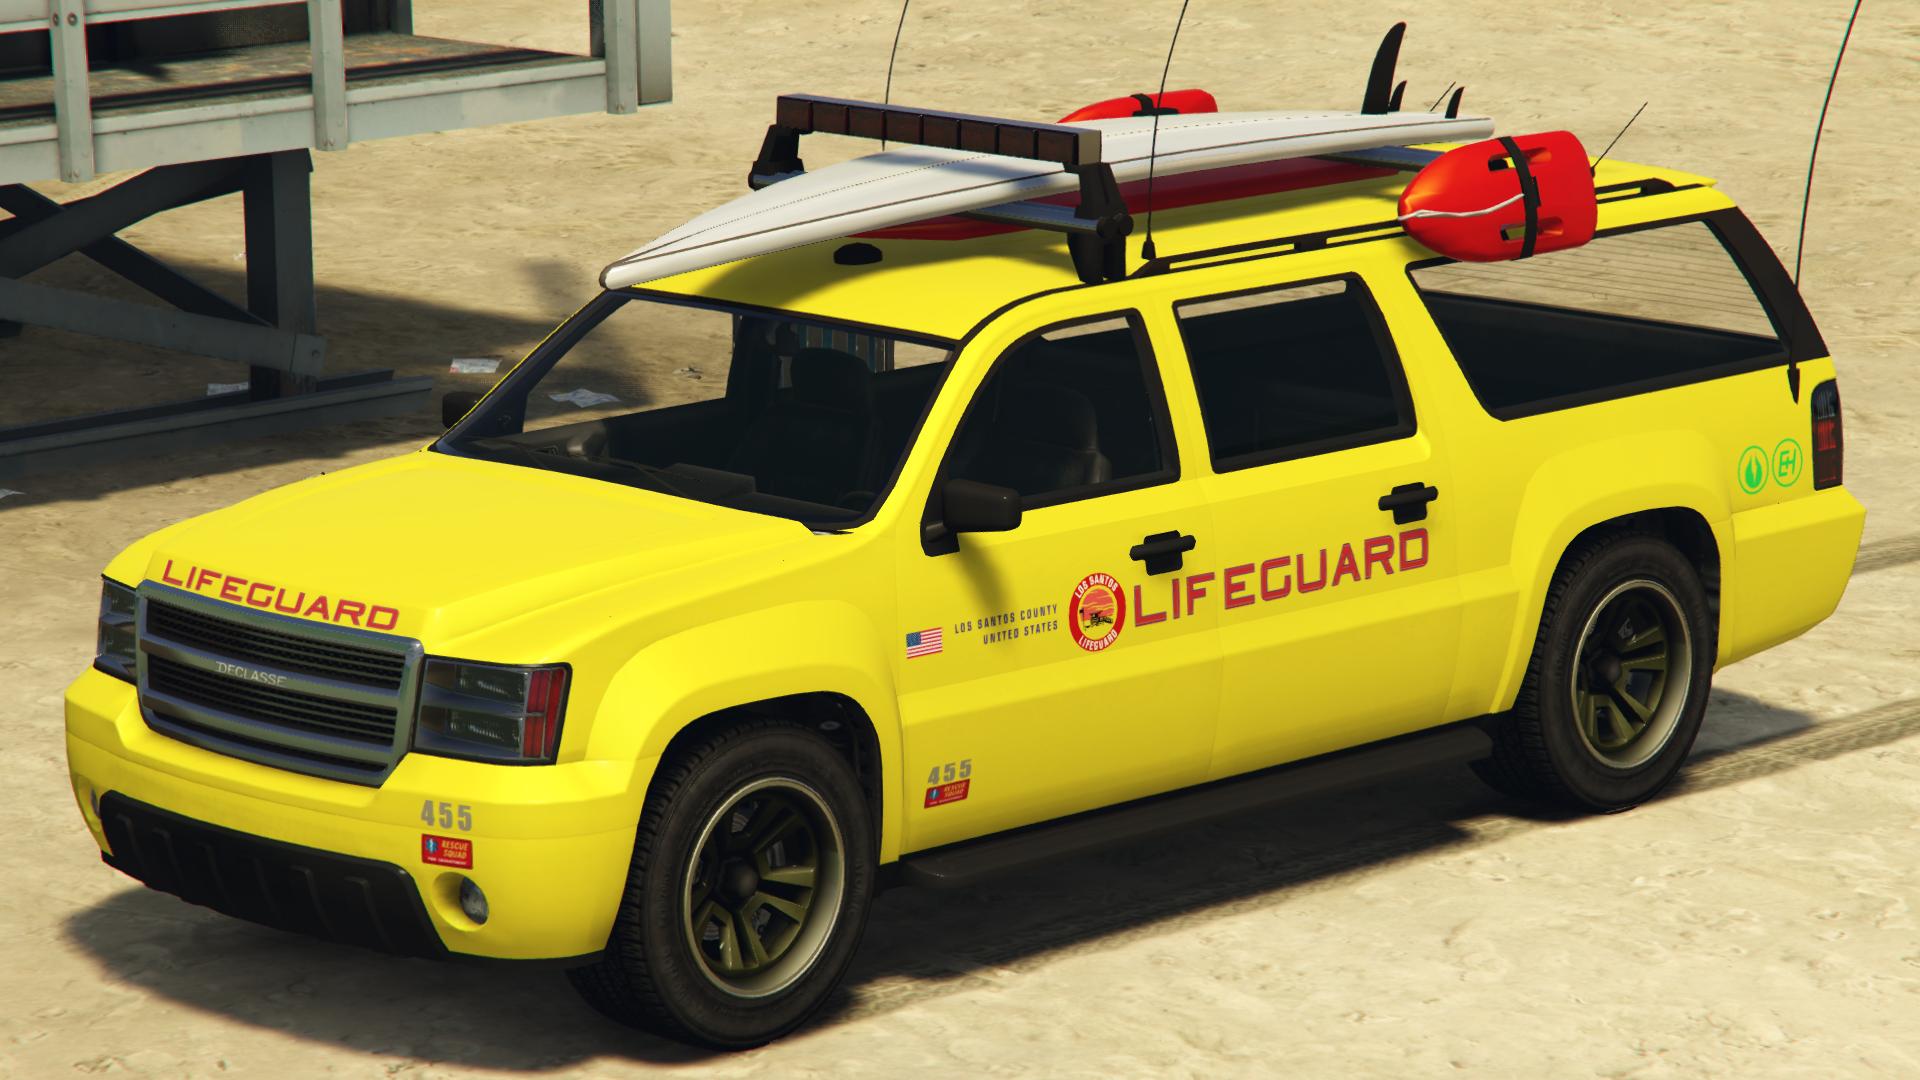 Lifeguard Gta Wiki Fandom Powered By Wikia